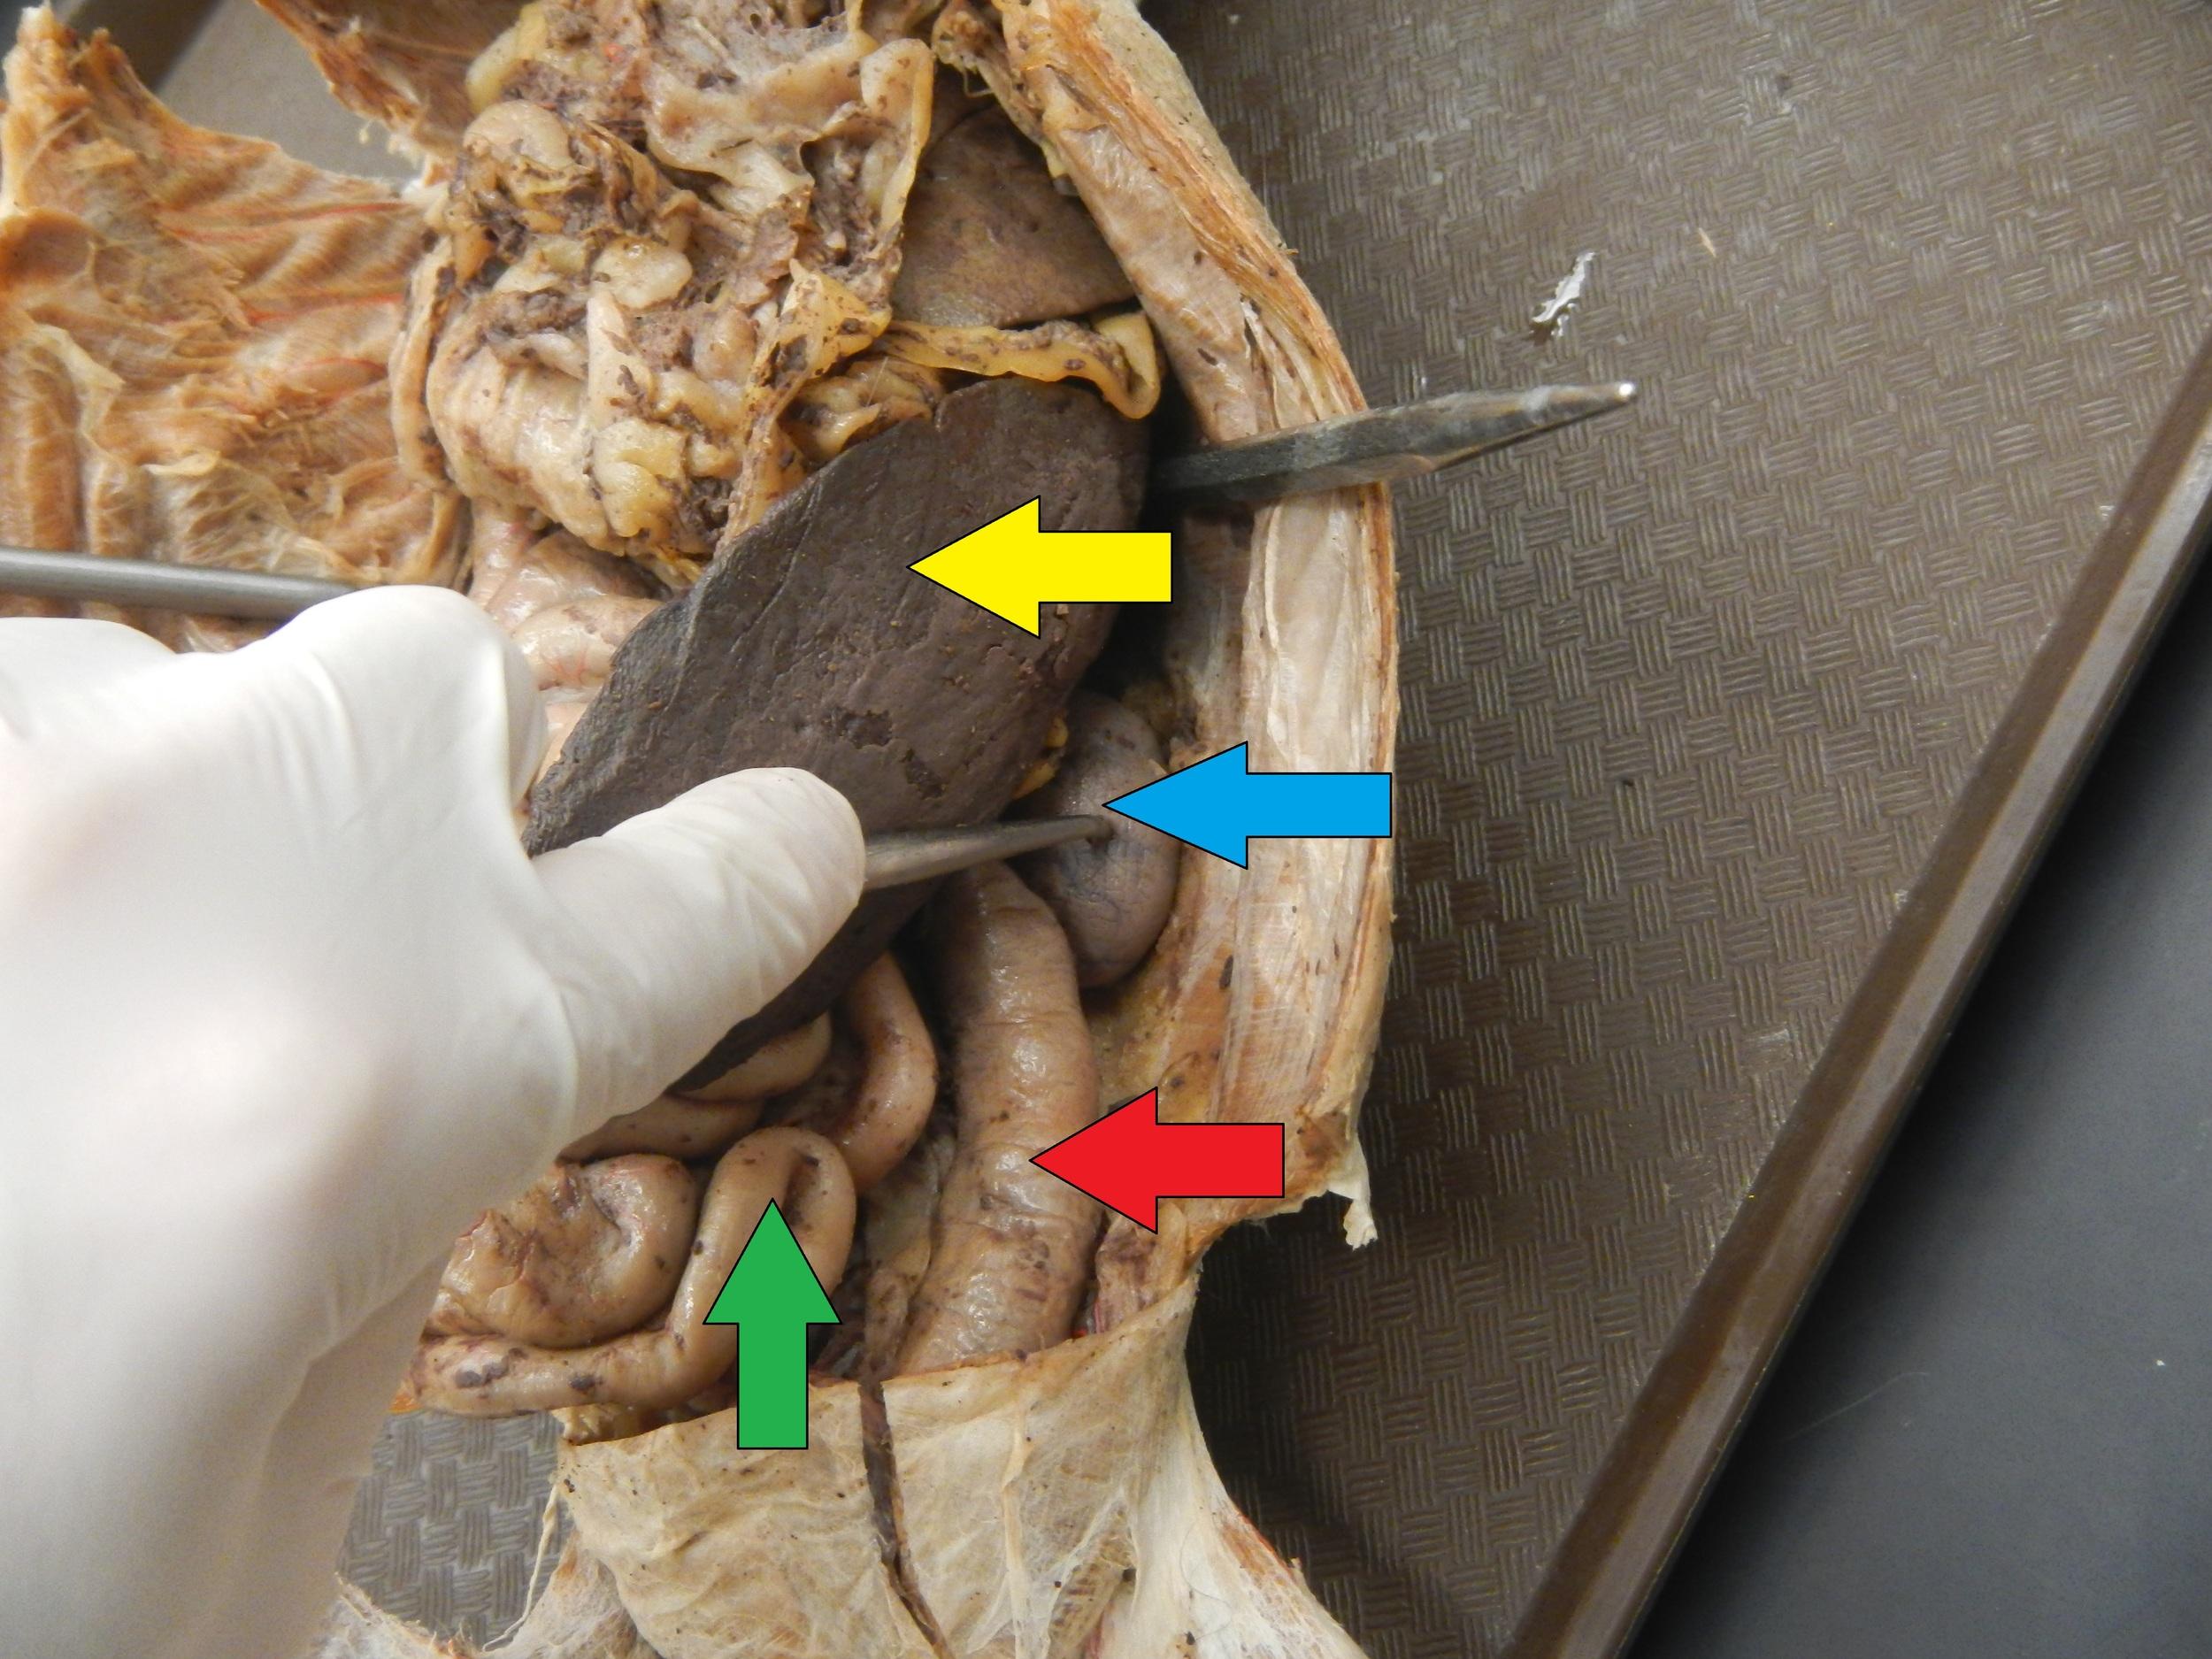 Yellow - Spleen  Blue - Left Kidney  Red - Large Intestine  Green - Small Intestine